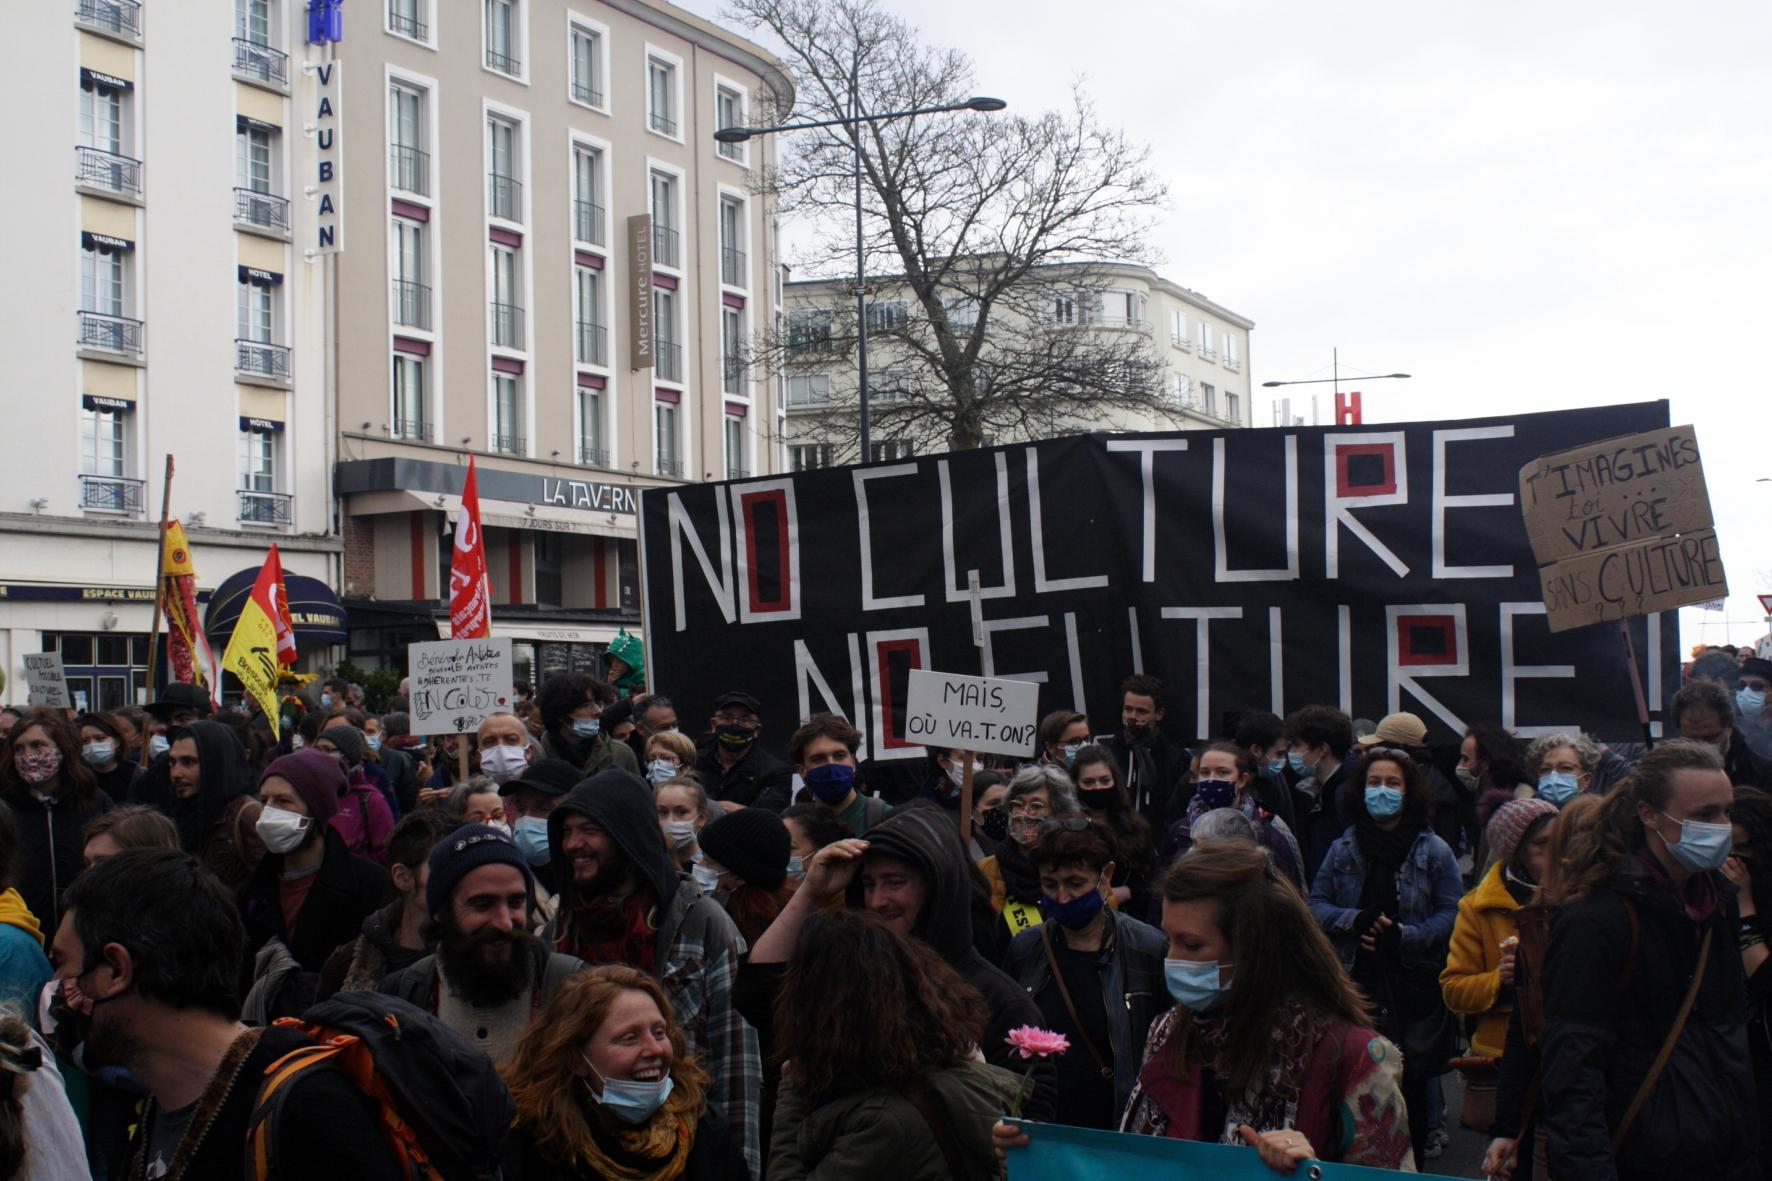 Manif-culture-Brest-20-03-21-124